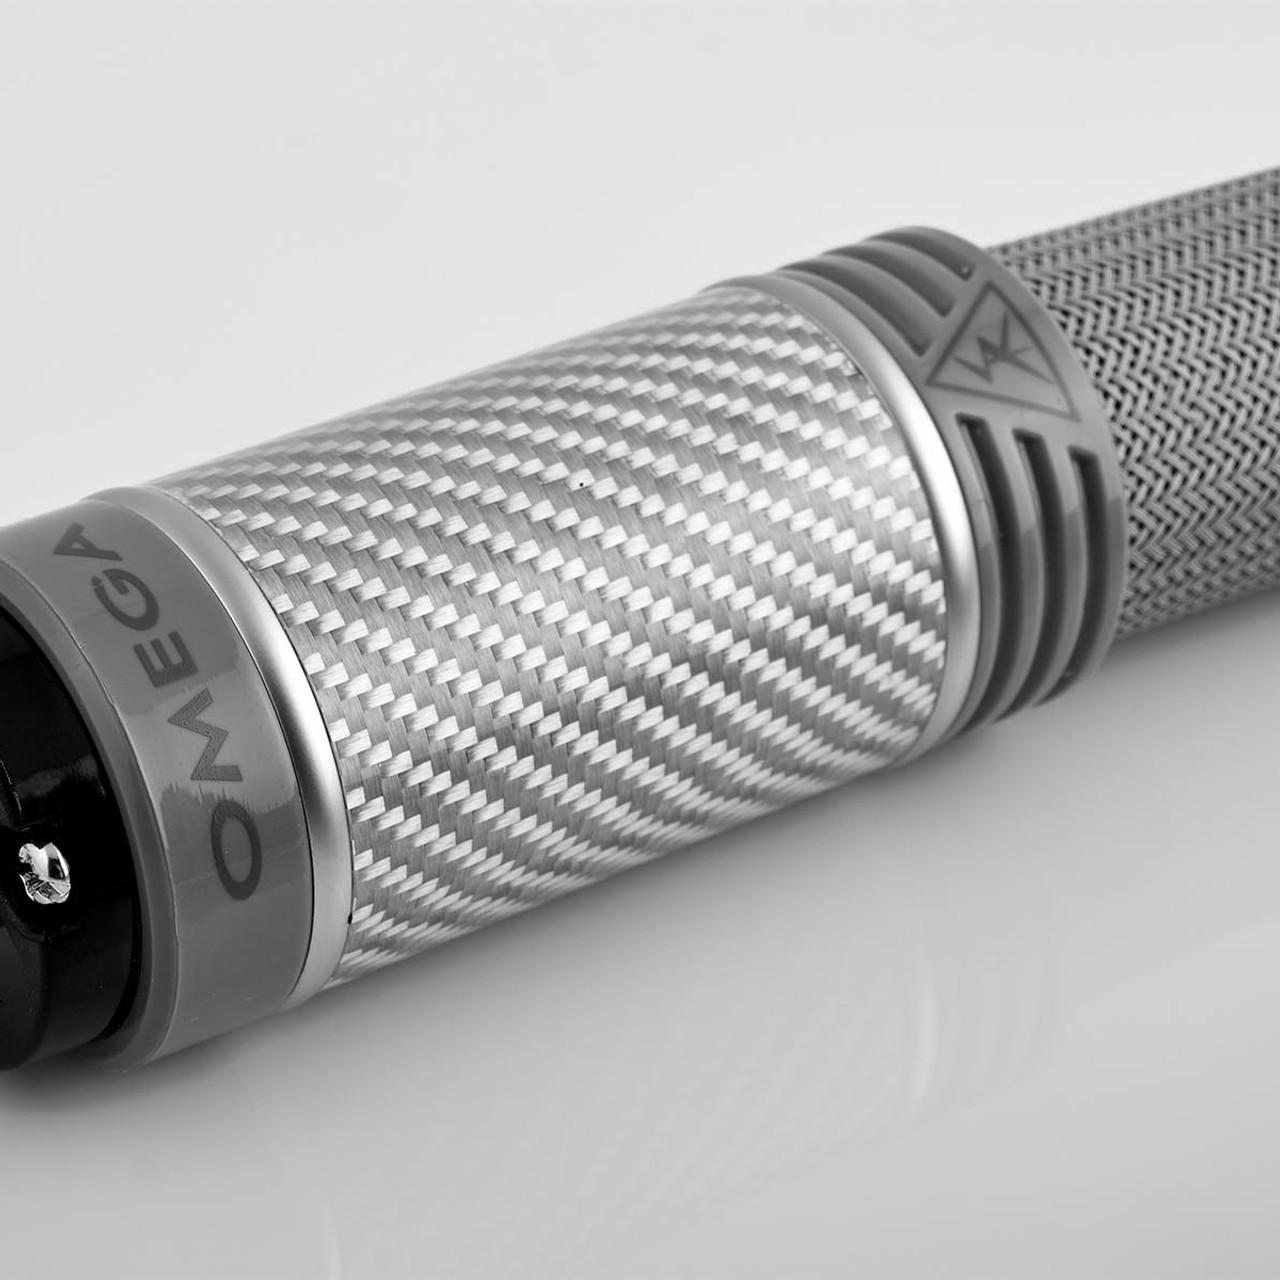 Shunyata Research Omega XC power cable